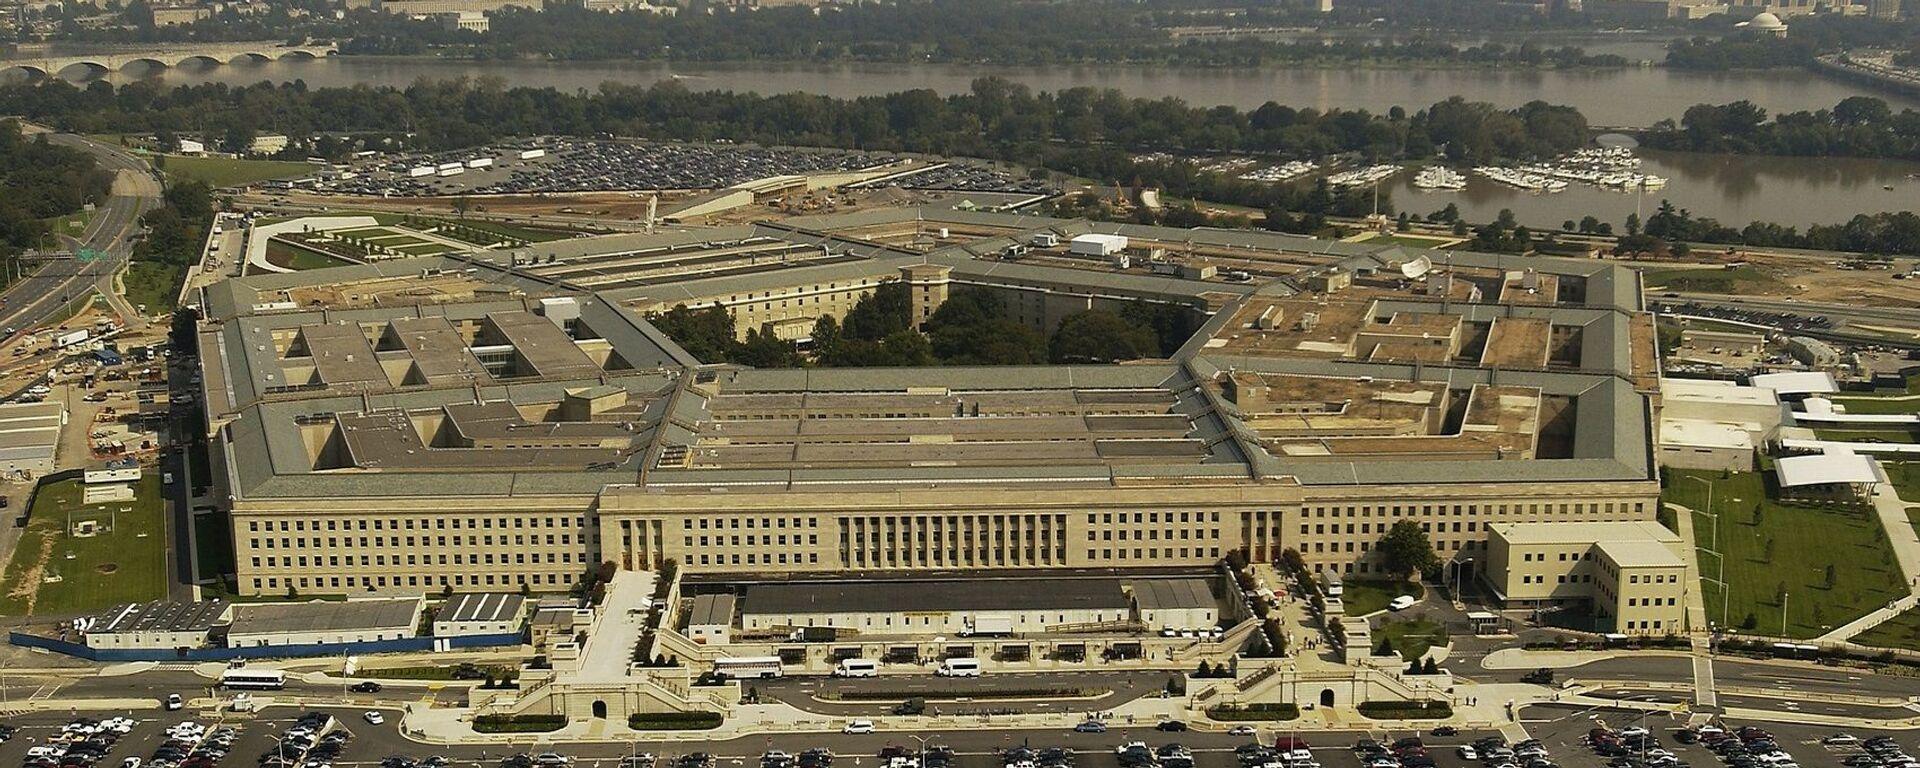 El Pentágono o Departamento de Defensa de Estados Unidos - Sputnik Mundo, 1920, 01.06.2021